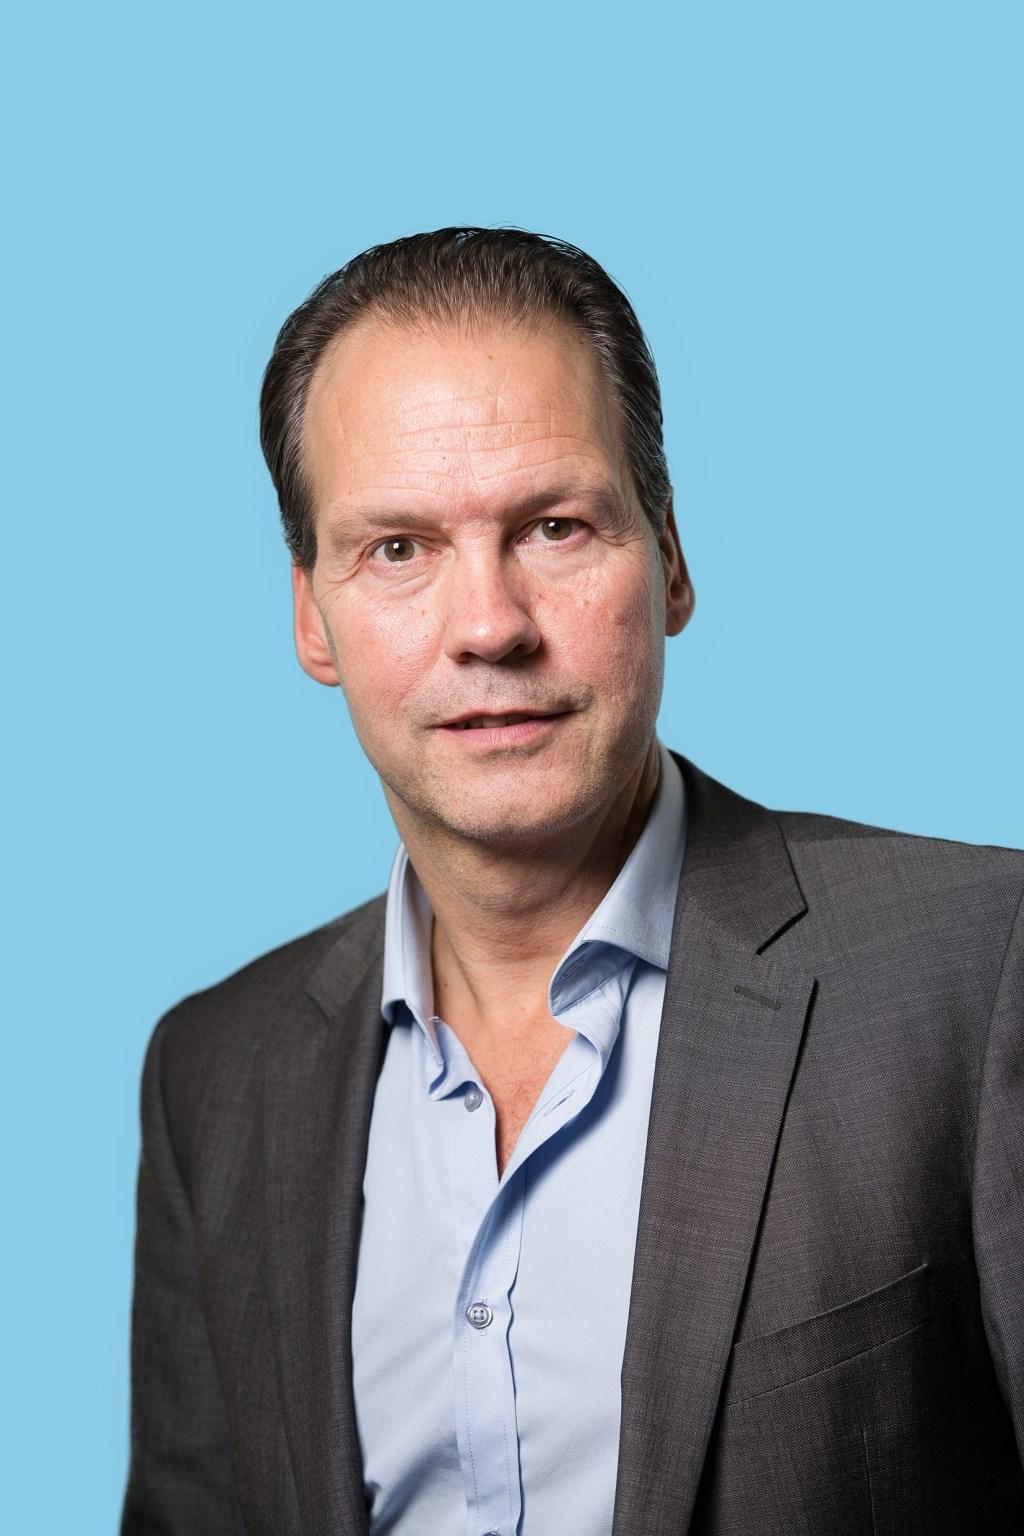 PvdA-Kamerlid John Kerstens Lex Draijer © Achterhoek Nieuws b.v.